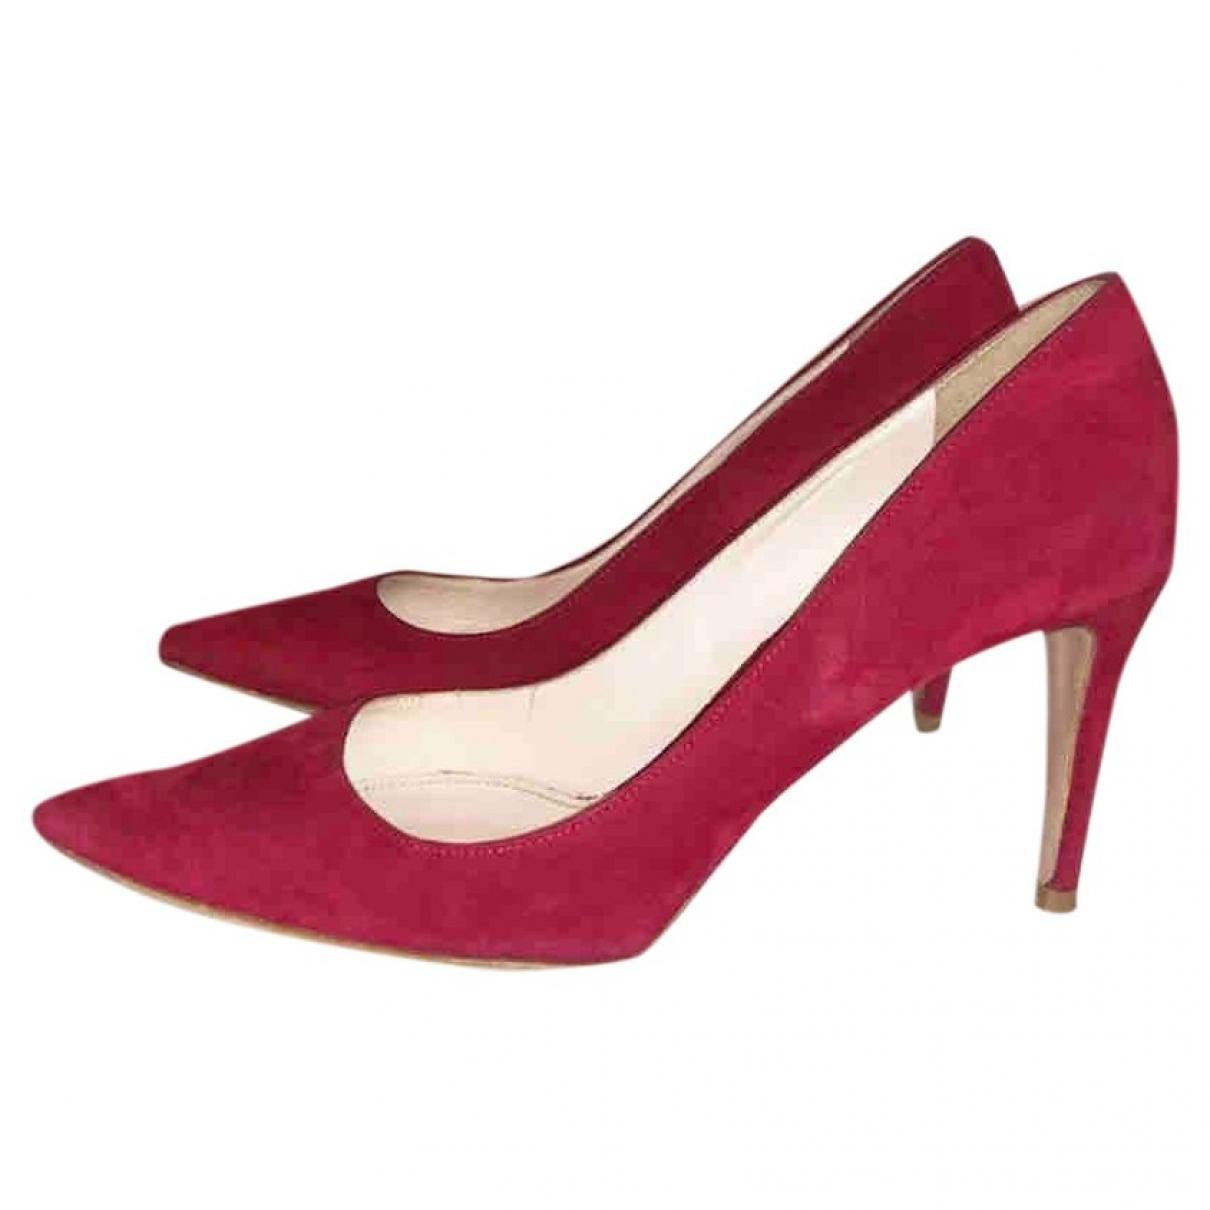 Prada - Escarpins   pour femme en suede - rouge